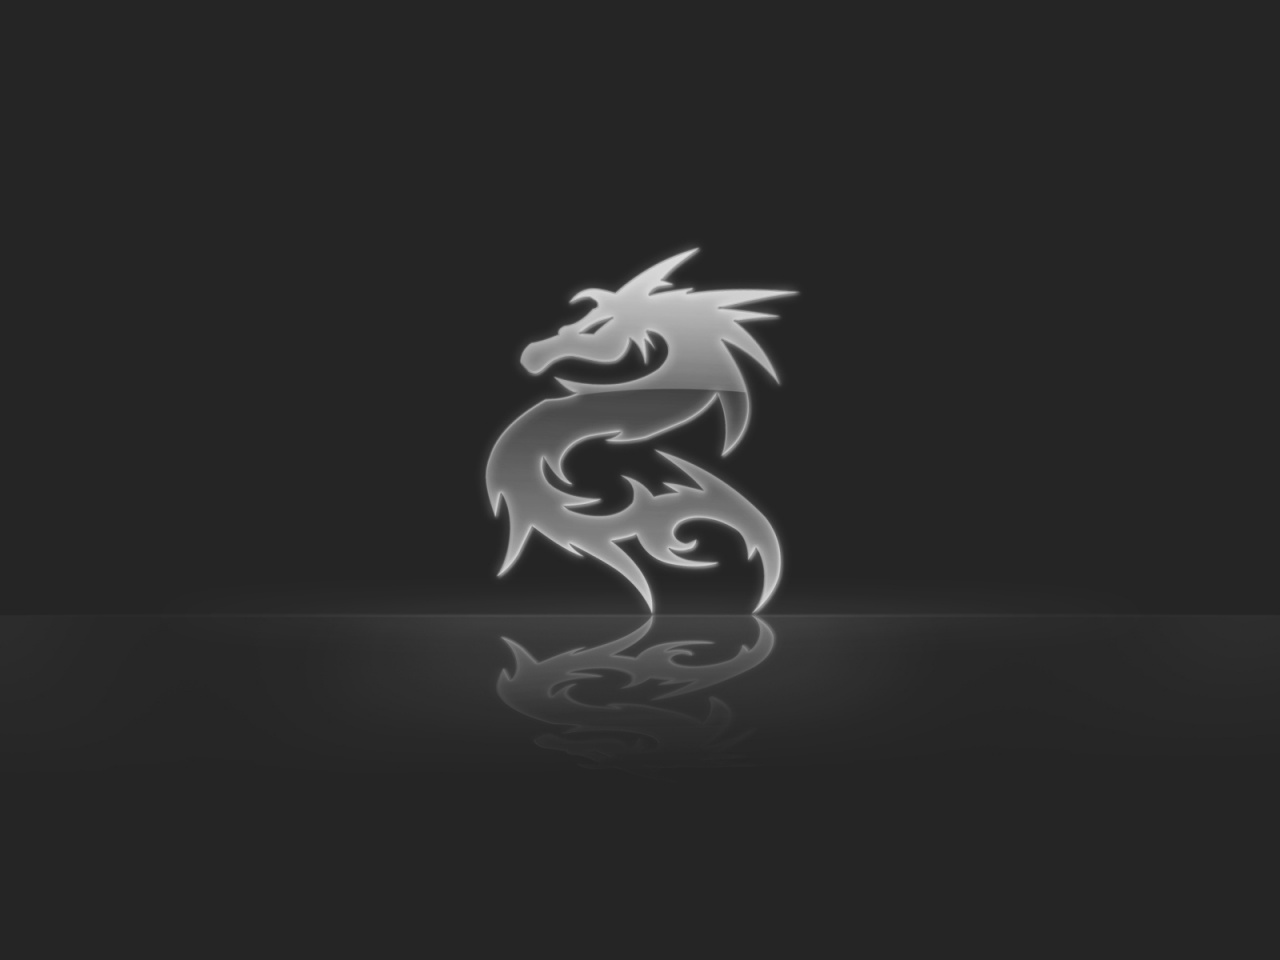 animated hd dragon wallpaper